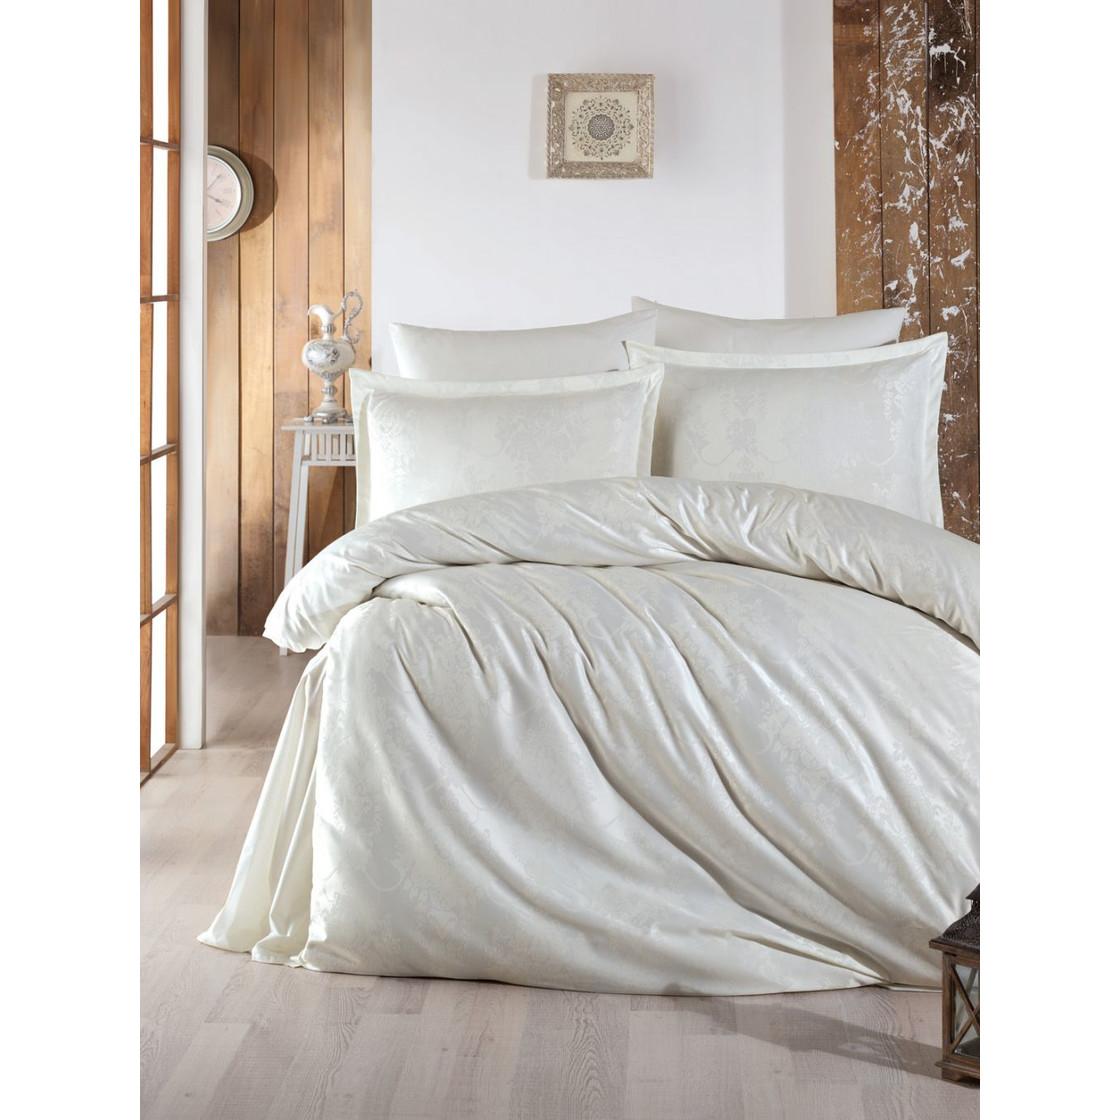 jaquard satin bettw sche 200x220 cm 2 x kissenbezug 80x80cm calista 39 90. Black Bedroom Furniture Sets. Home Design Ideas